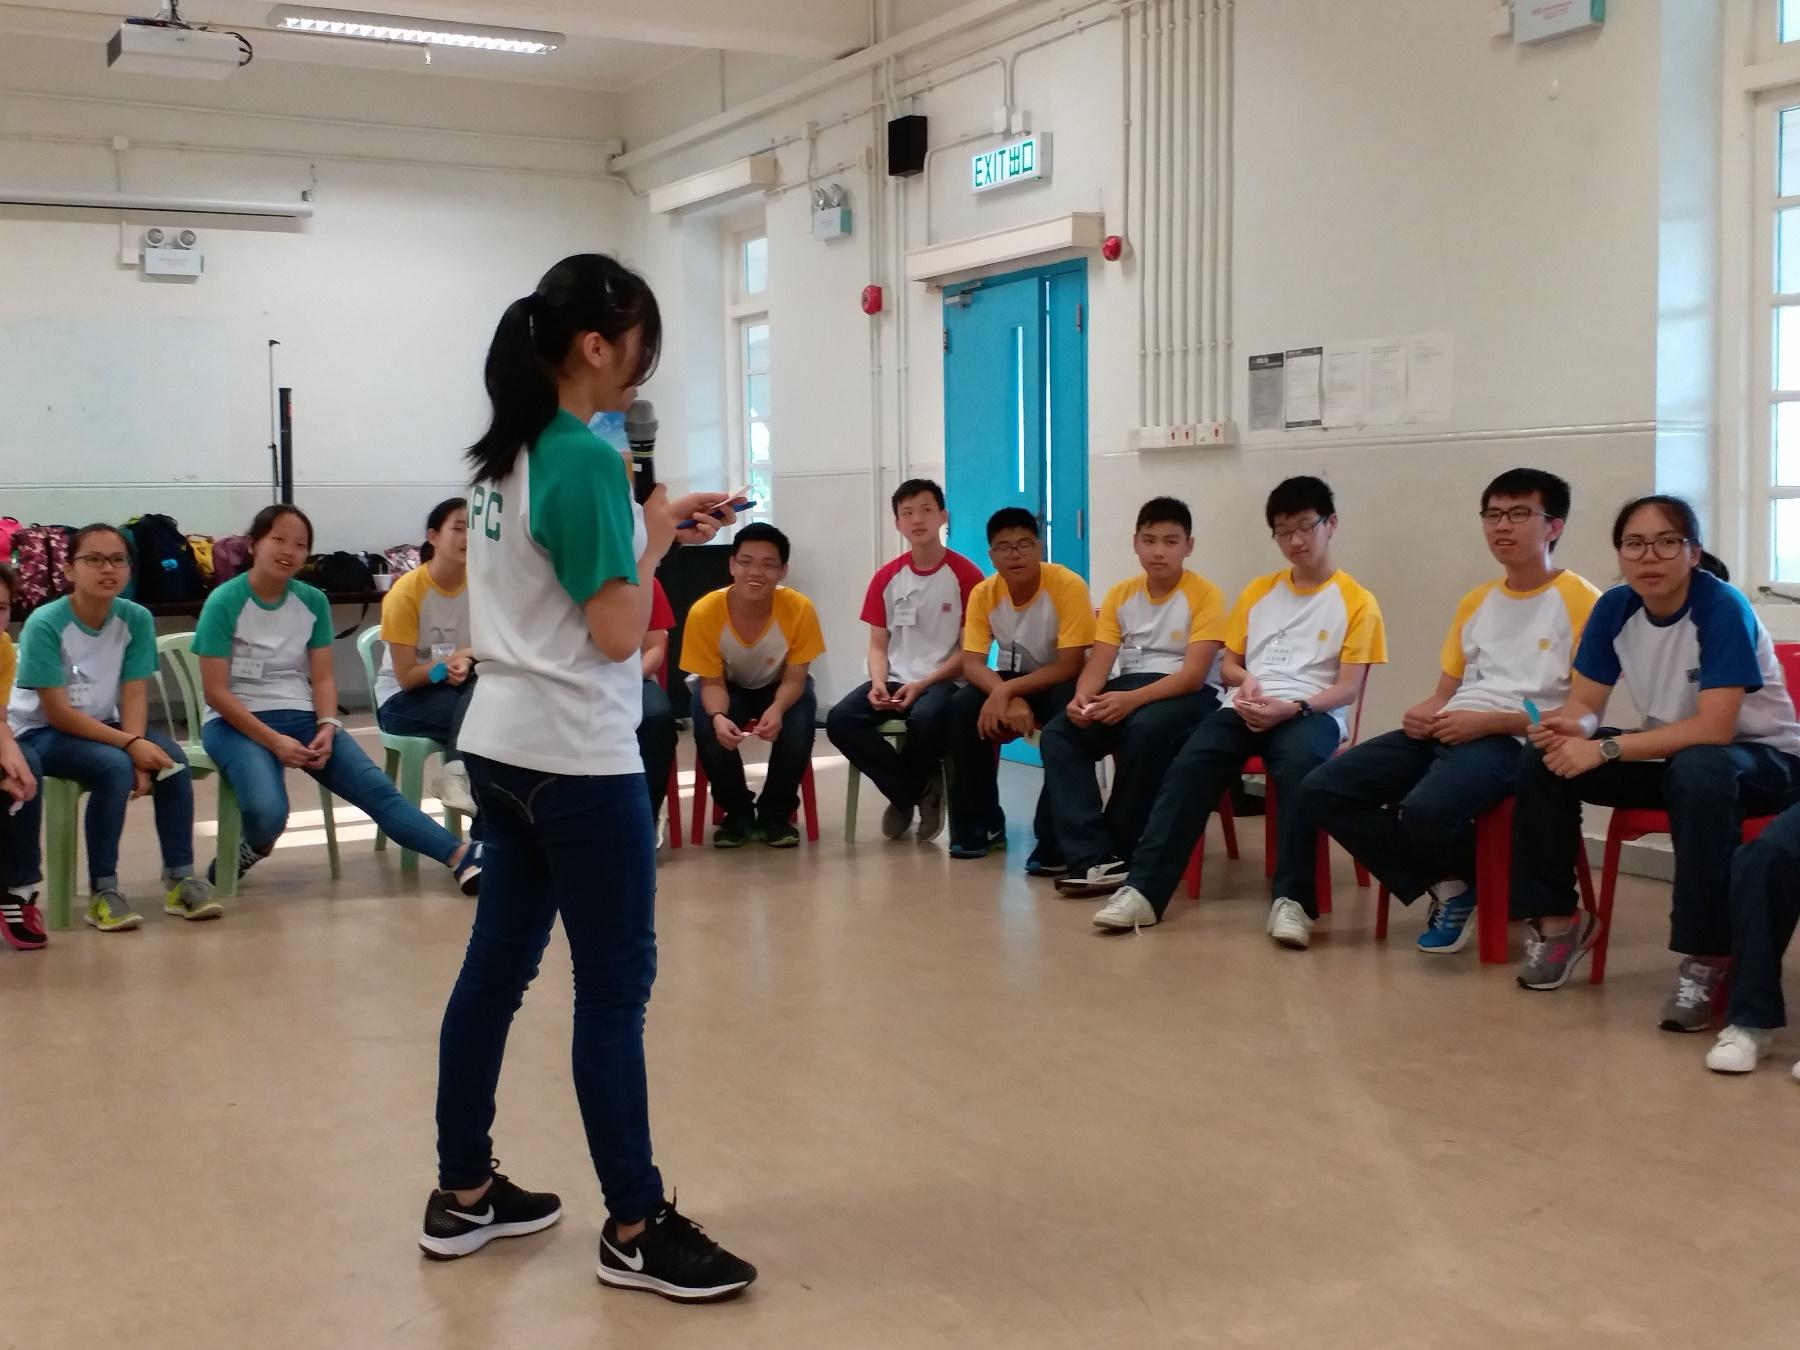 http://www.npc.edu.hk/sites/default/files/20171012_165820.jpg